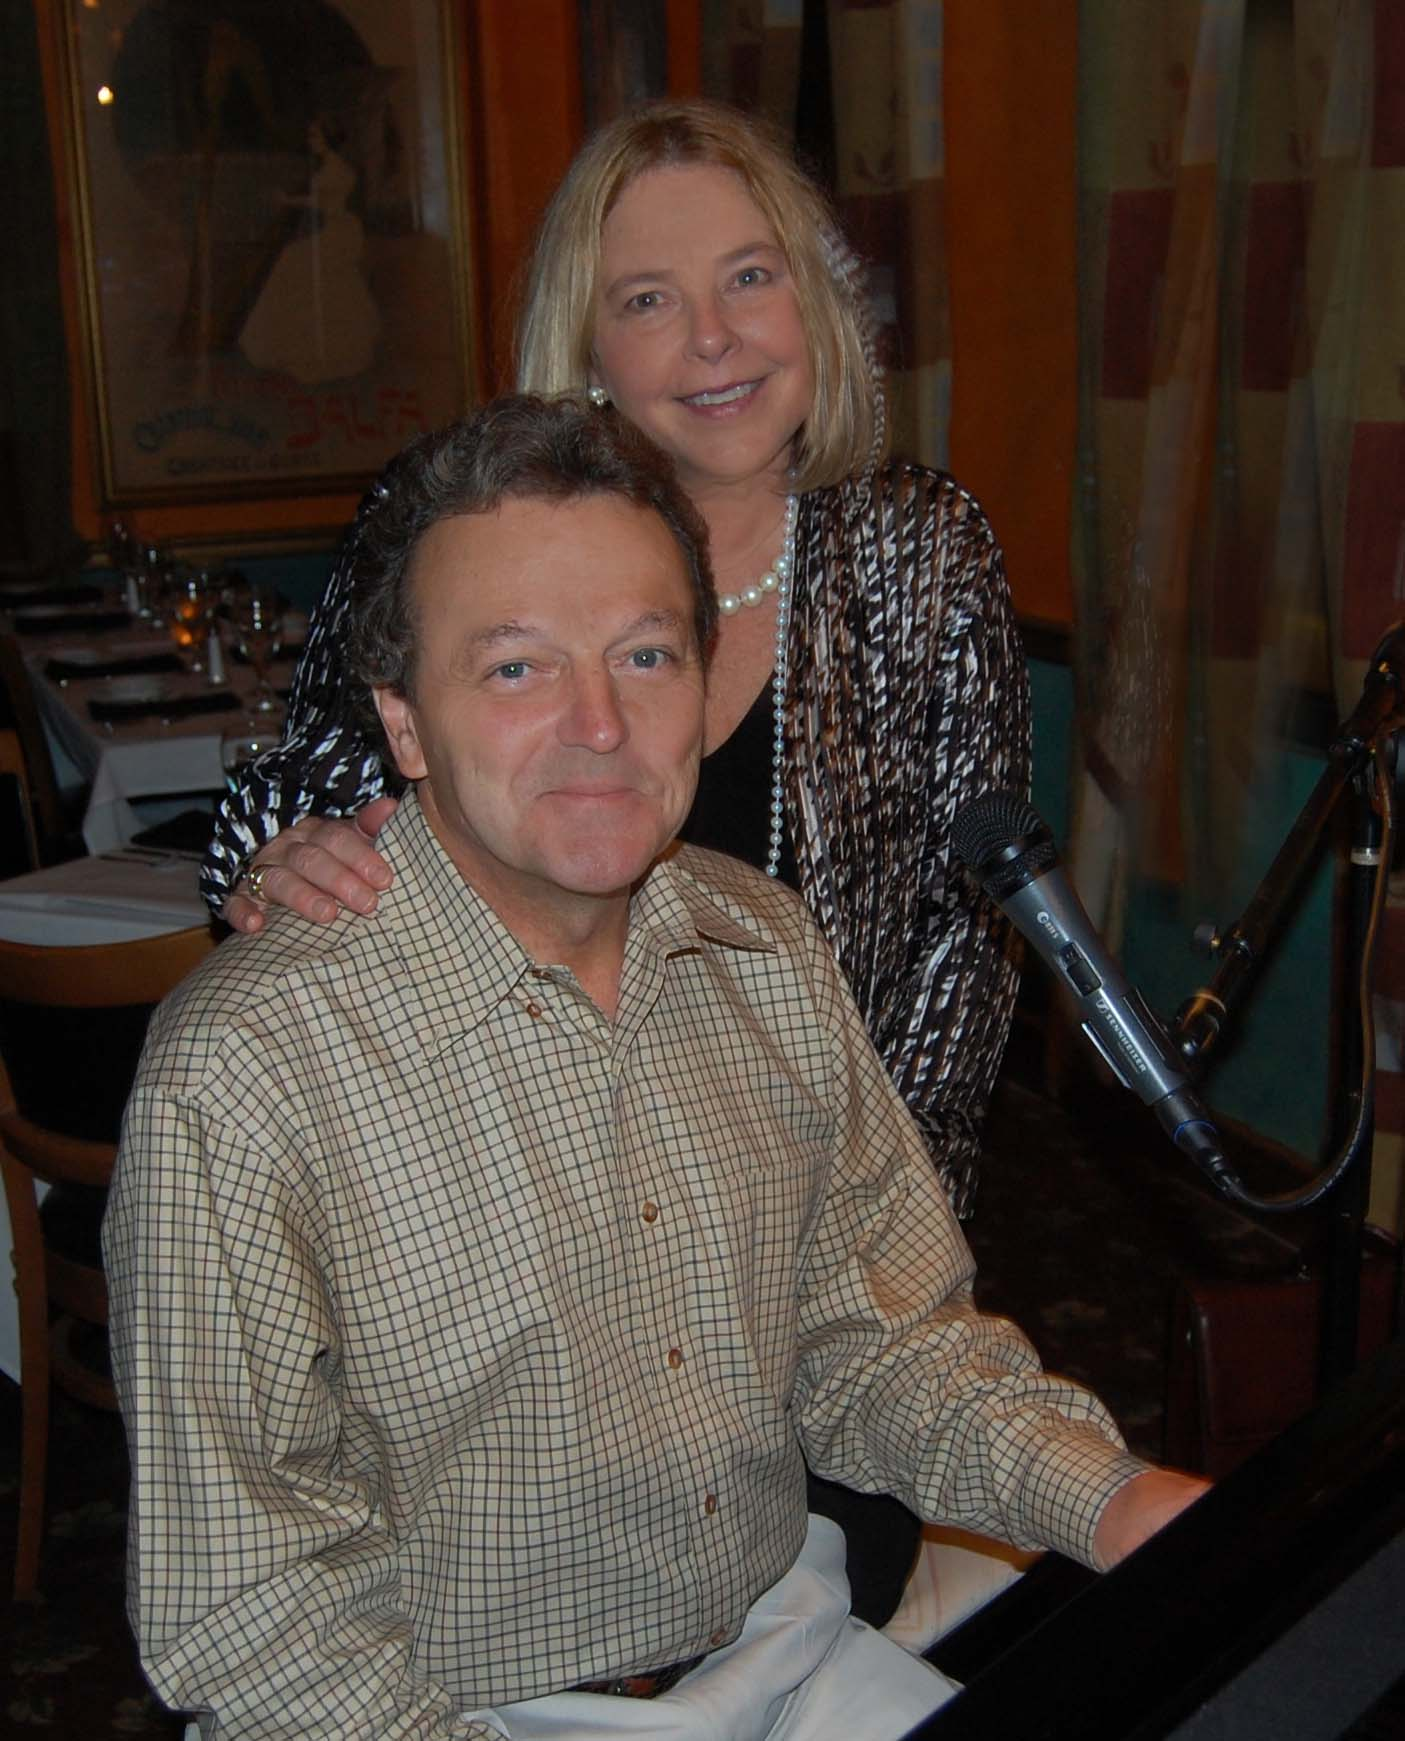 Erin Dickins with Pianist Stef Scaggiari